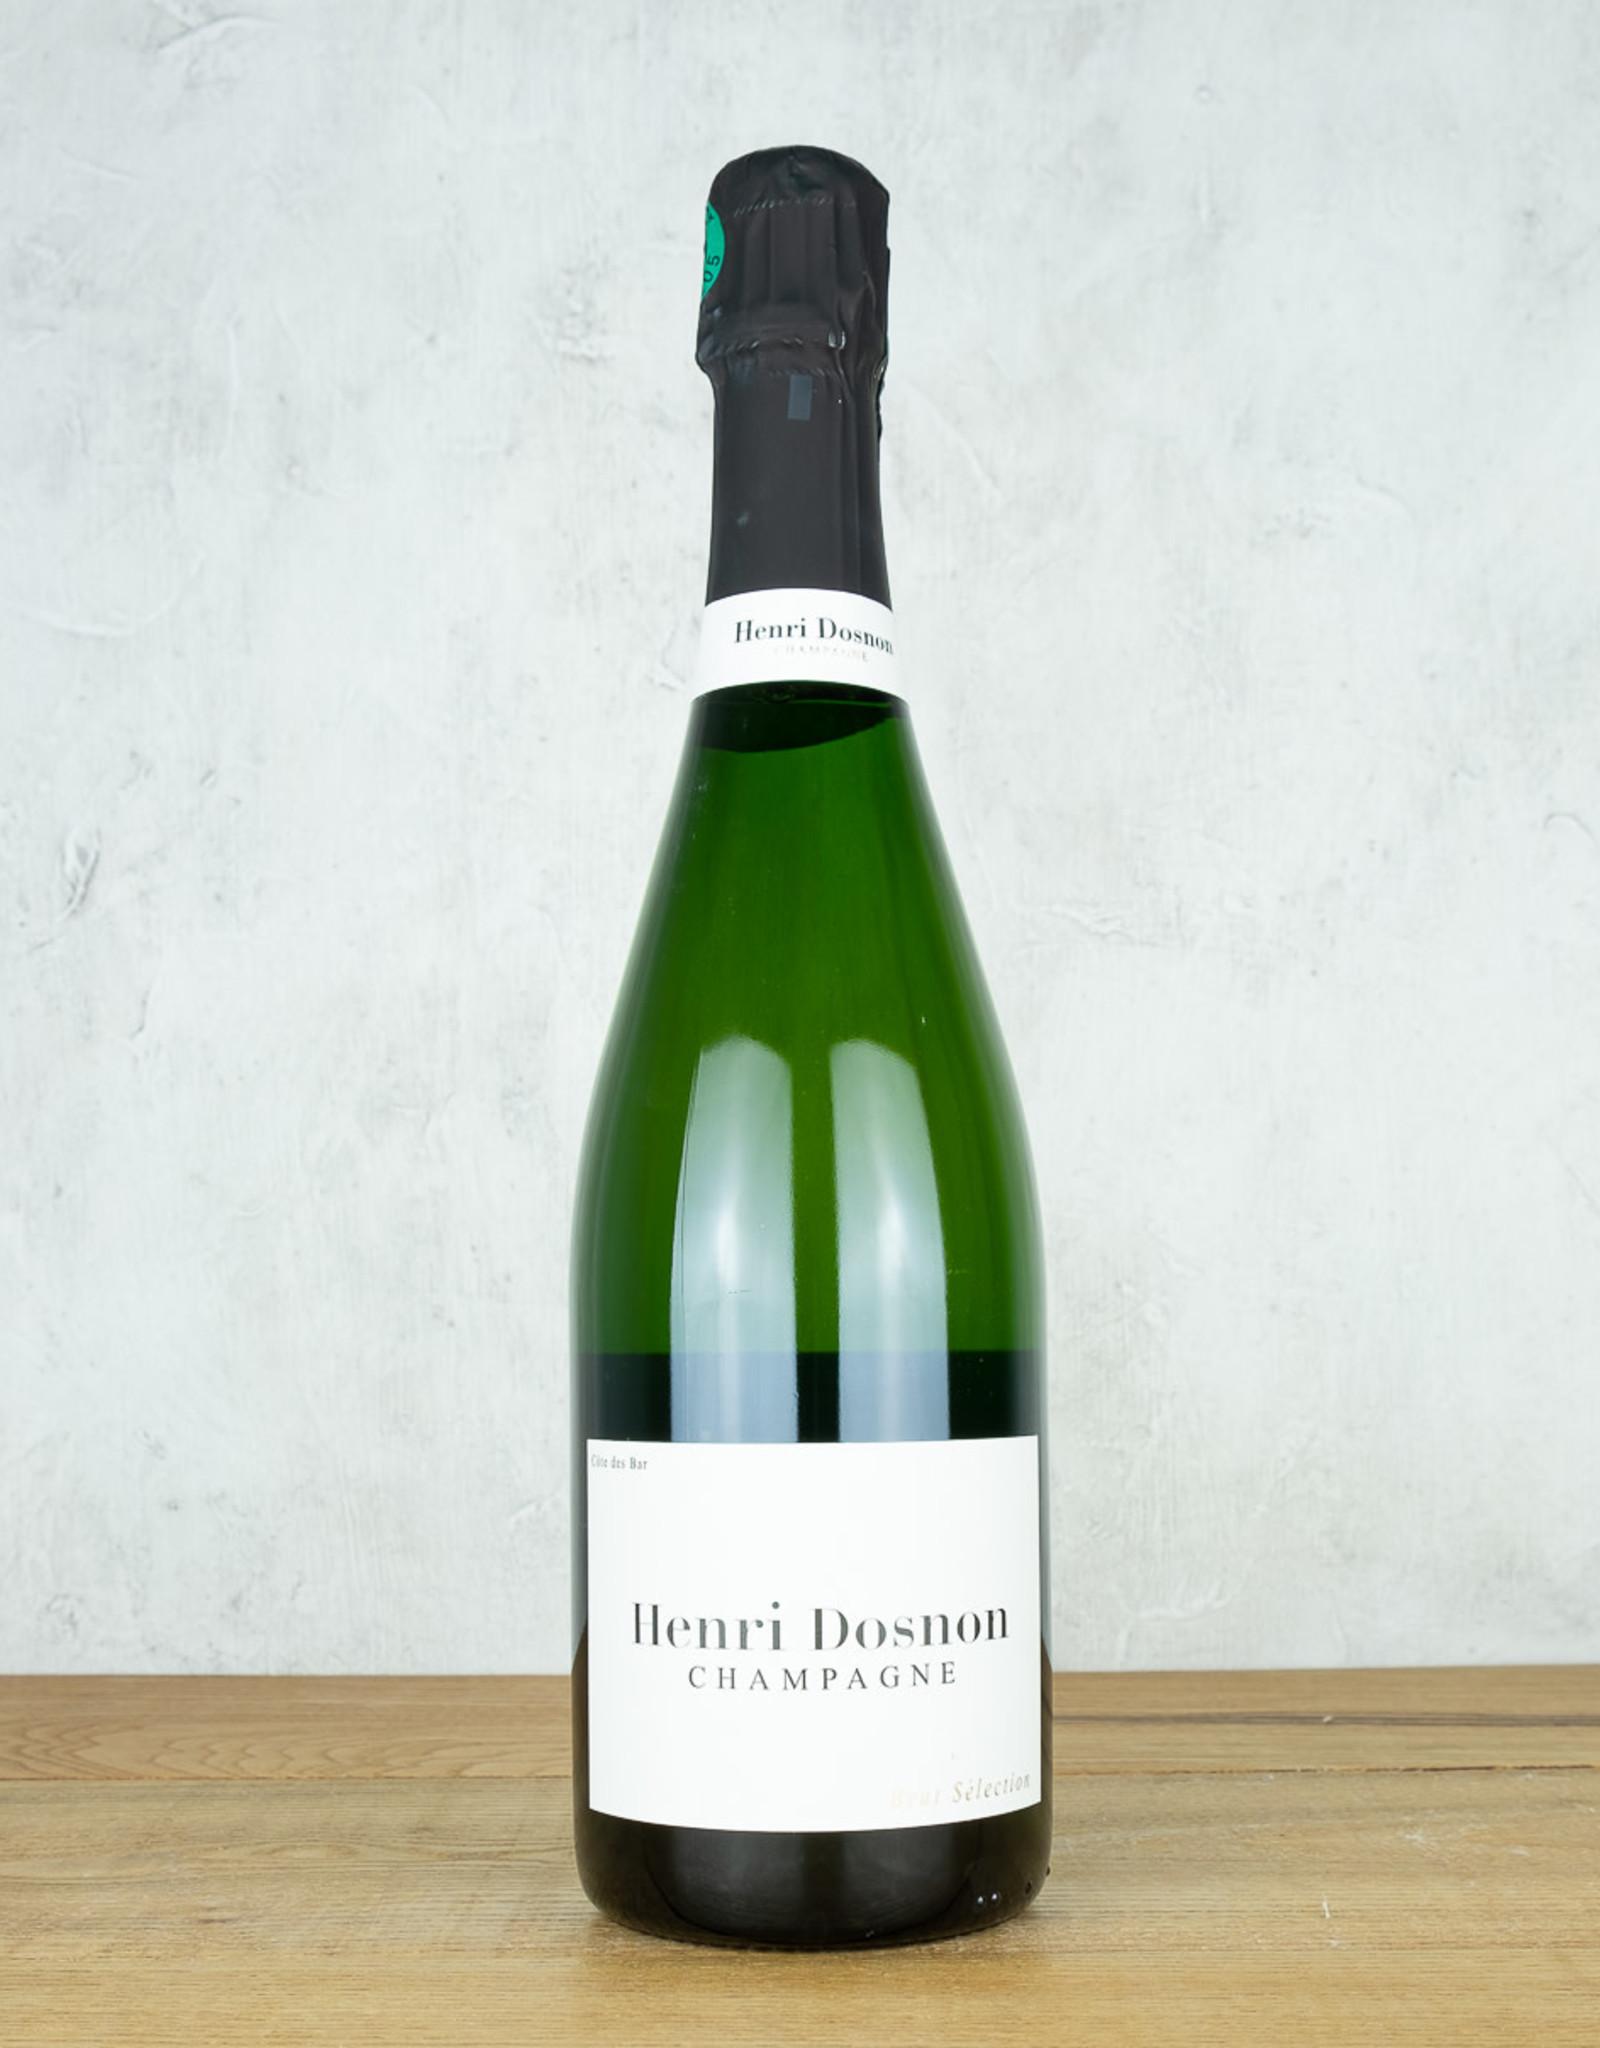 Champagne Henri Dosnon Brut